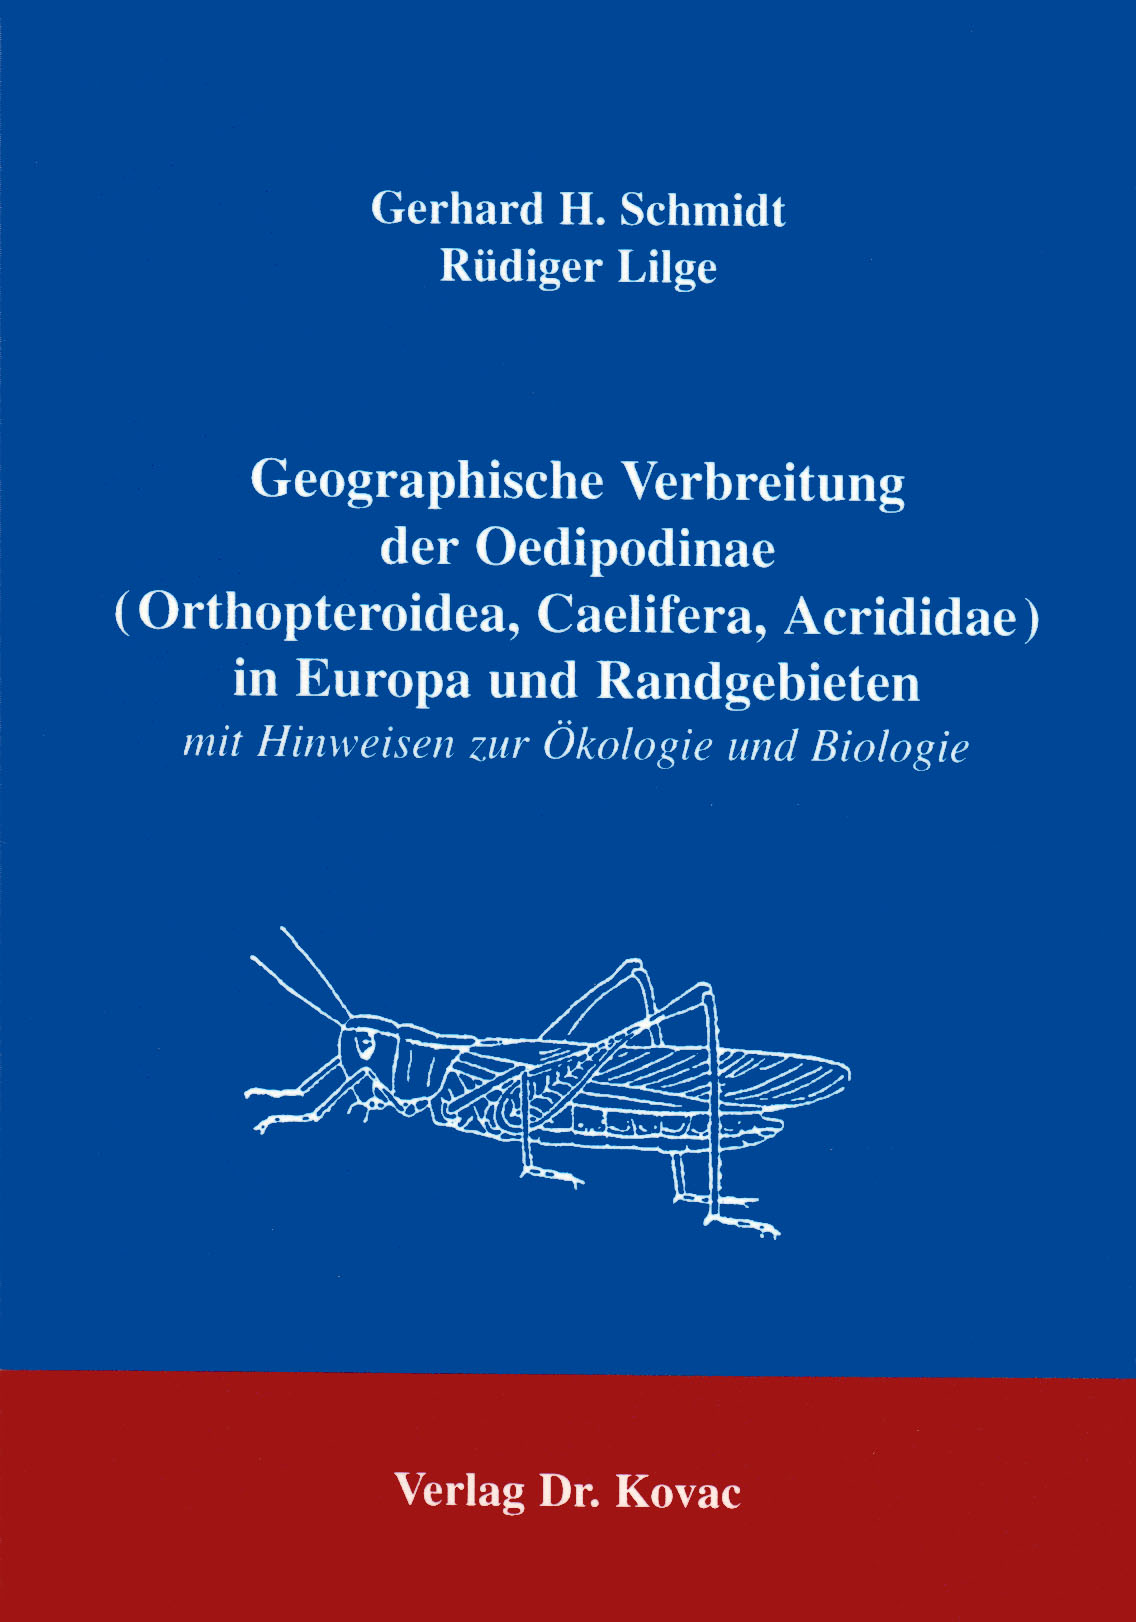 Cover: Geographische Verbreitung der Oedipodinae (Orthopteroidea, Caelifera, Acrididae) in Europa und Randgebieten